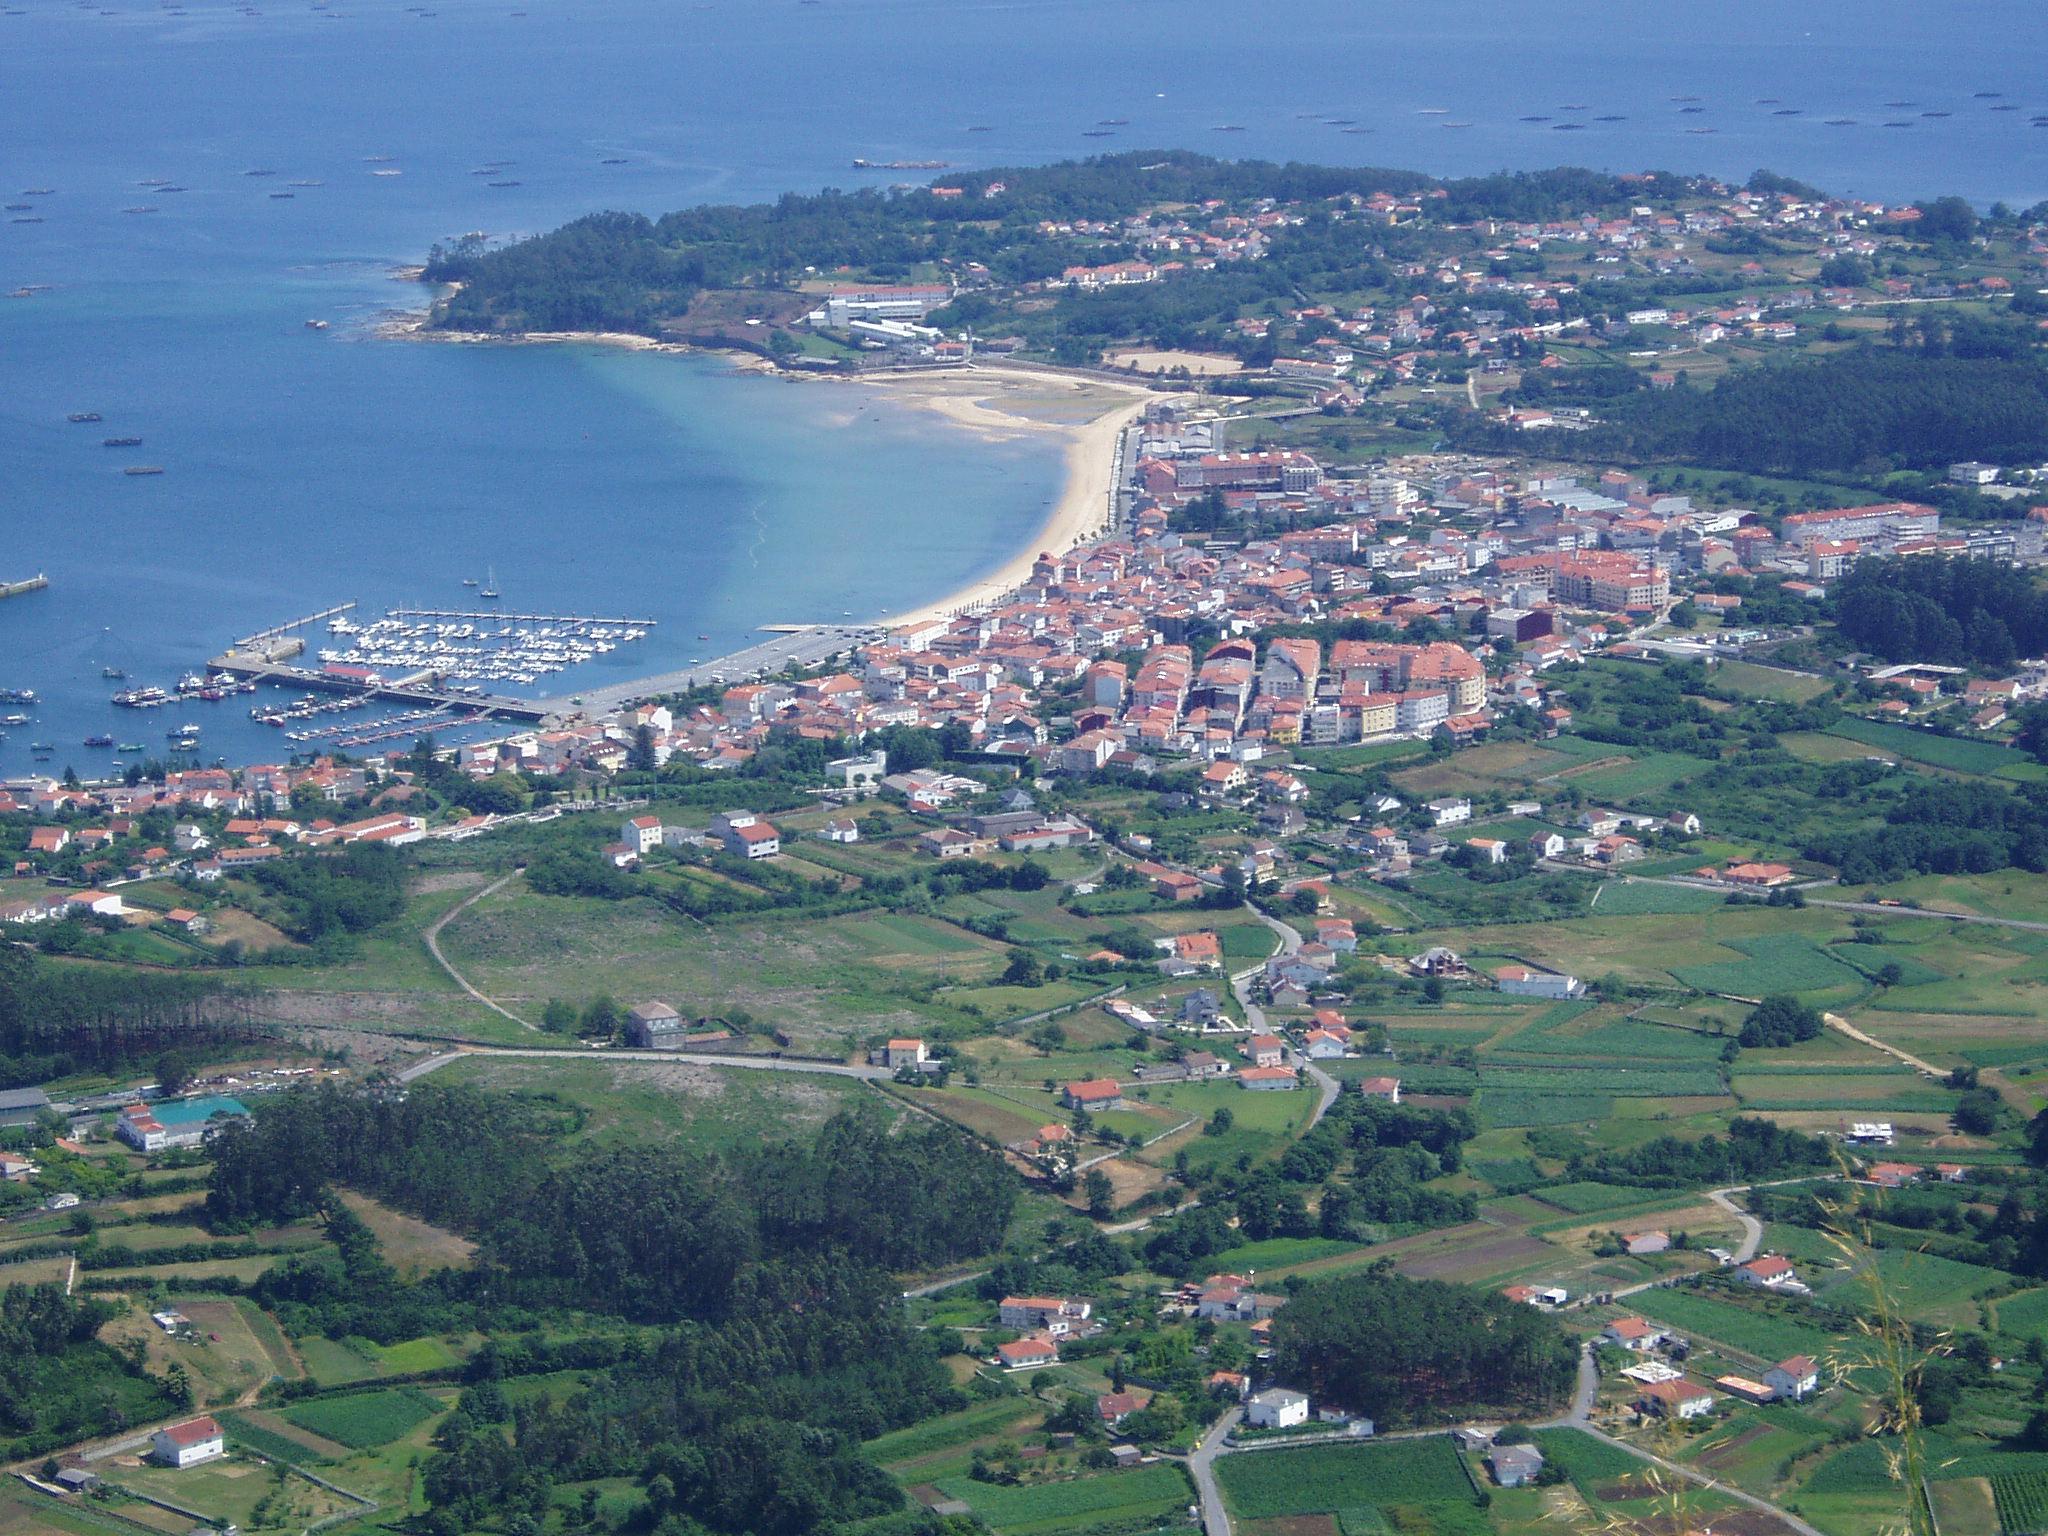 Foto playa Fontenla. Foto aerea de Boiro